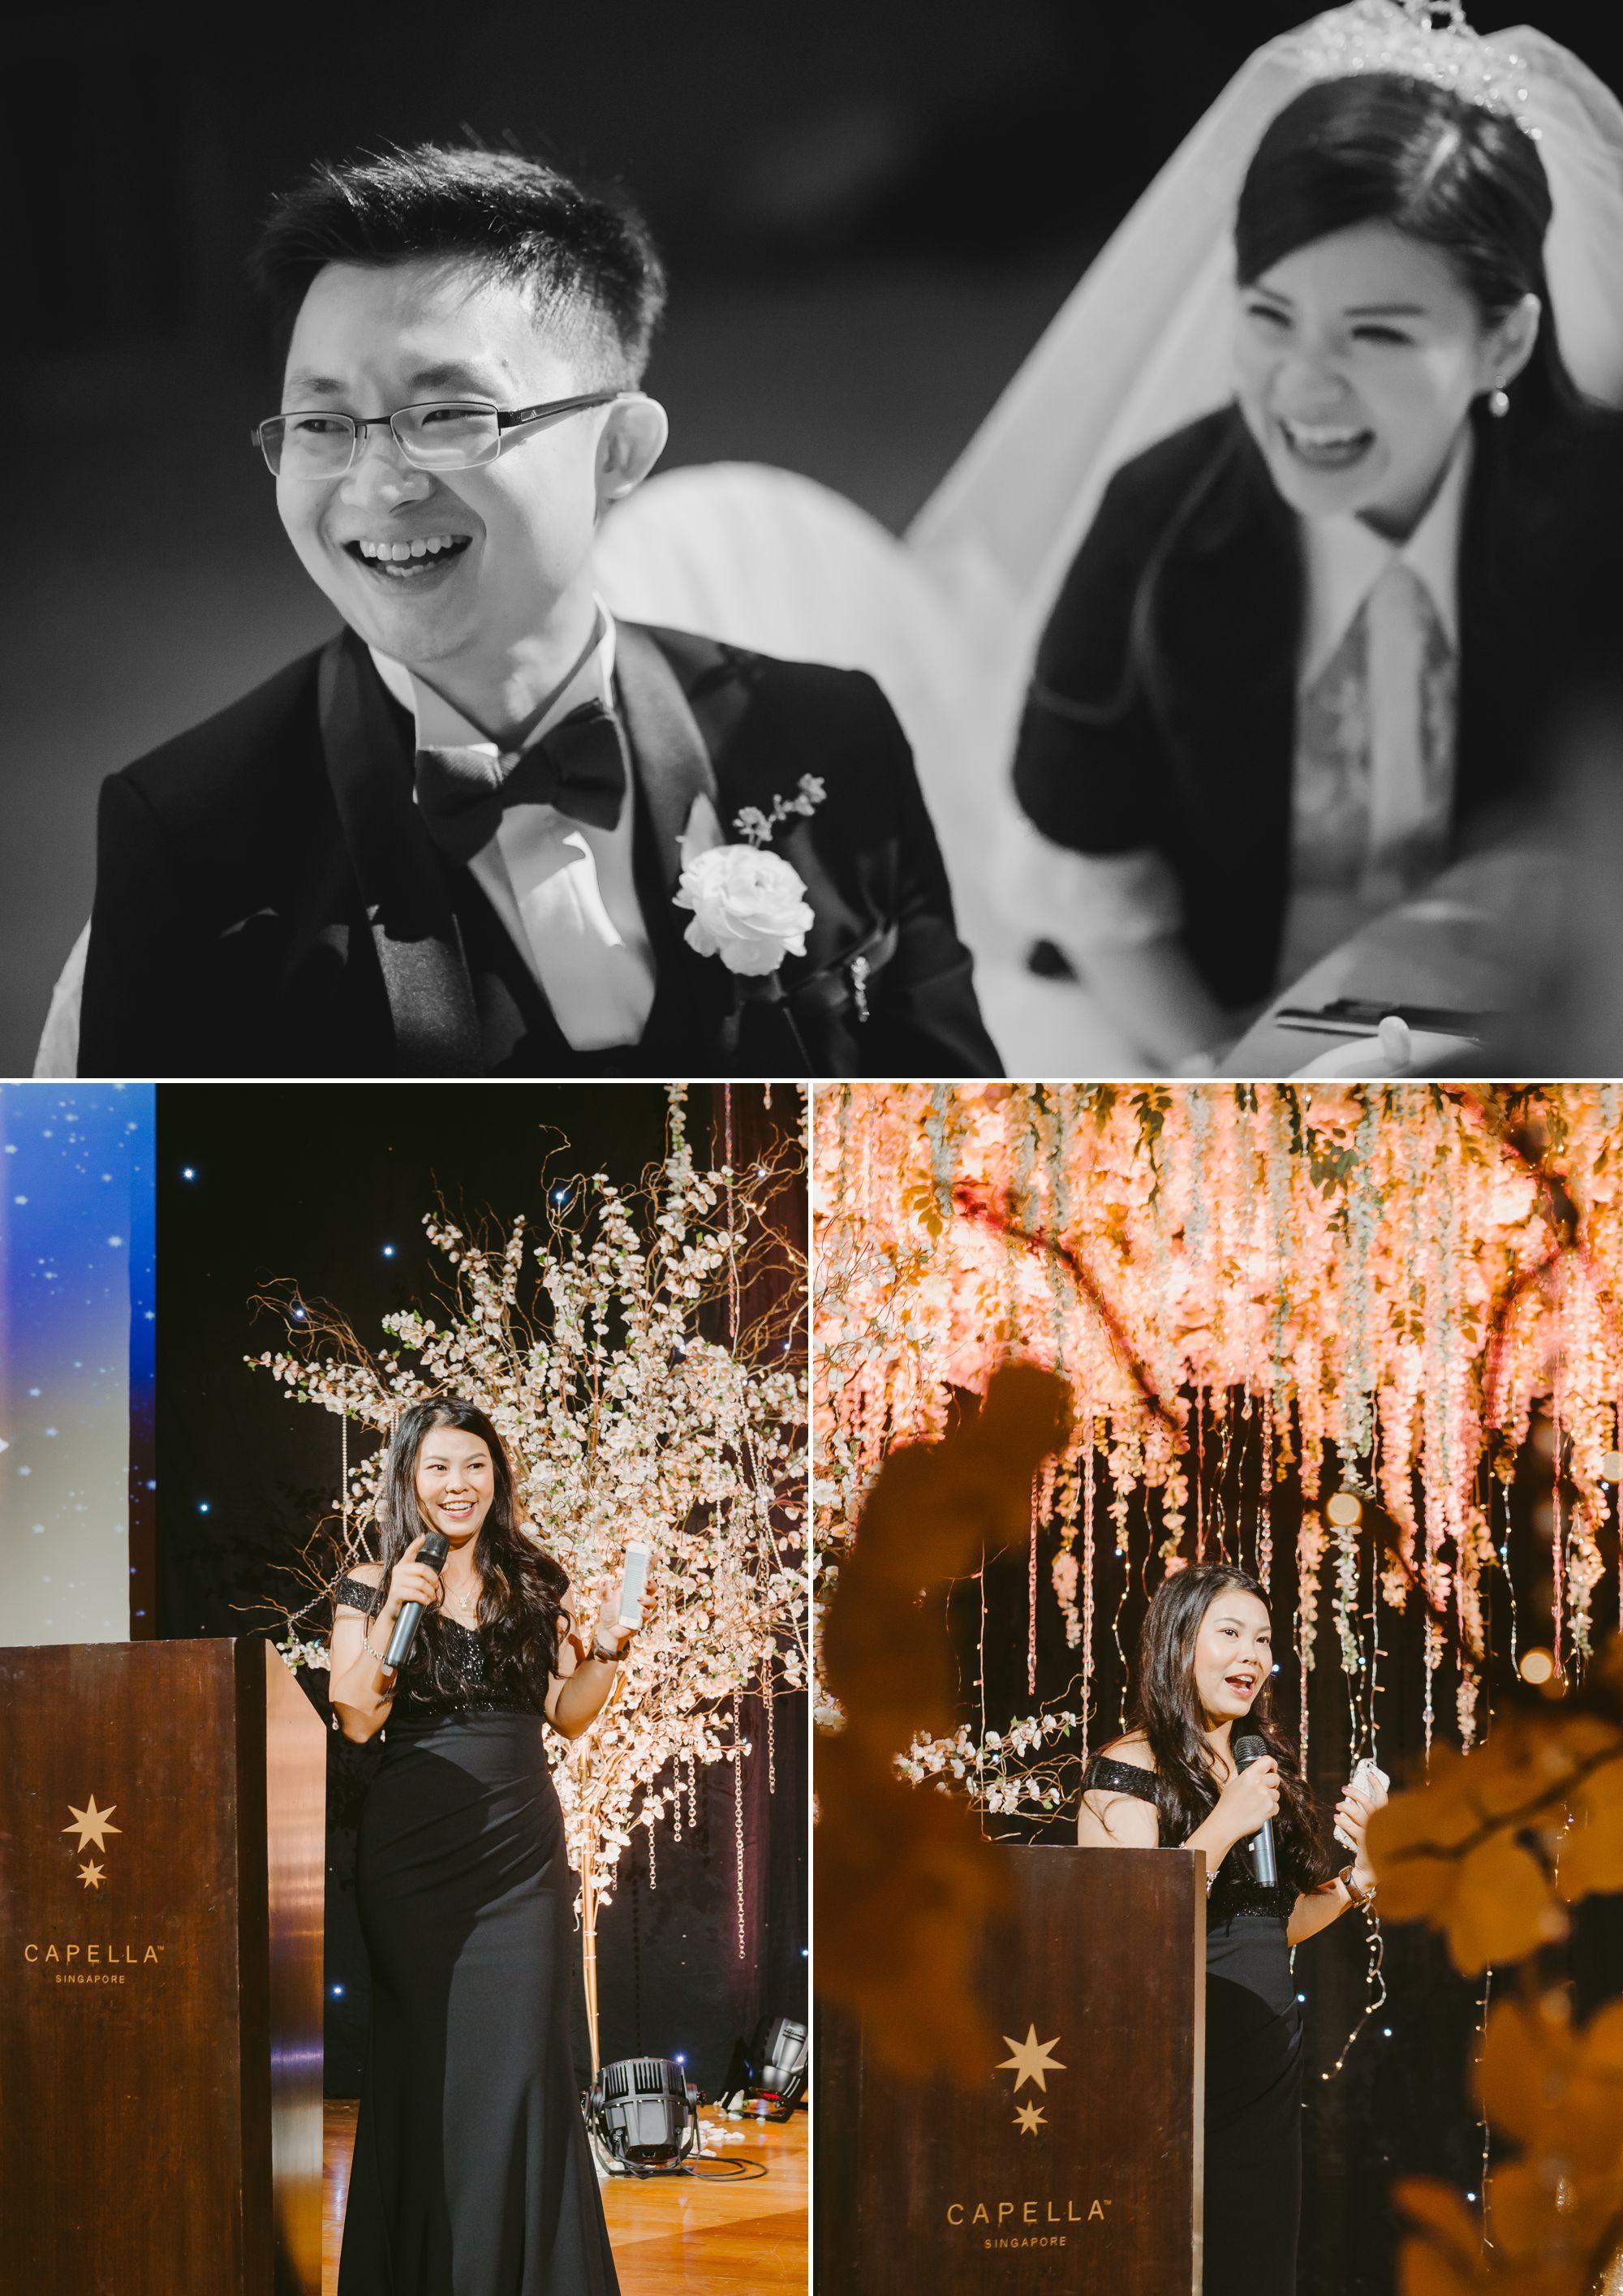 capella_singapore_wedding_ 55.jpg